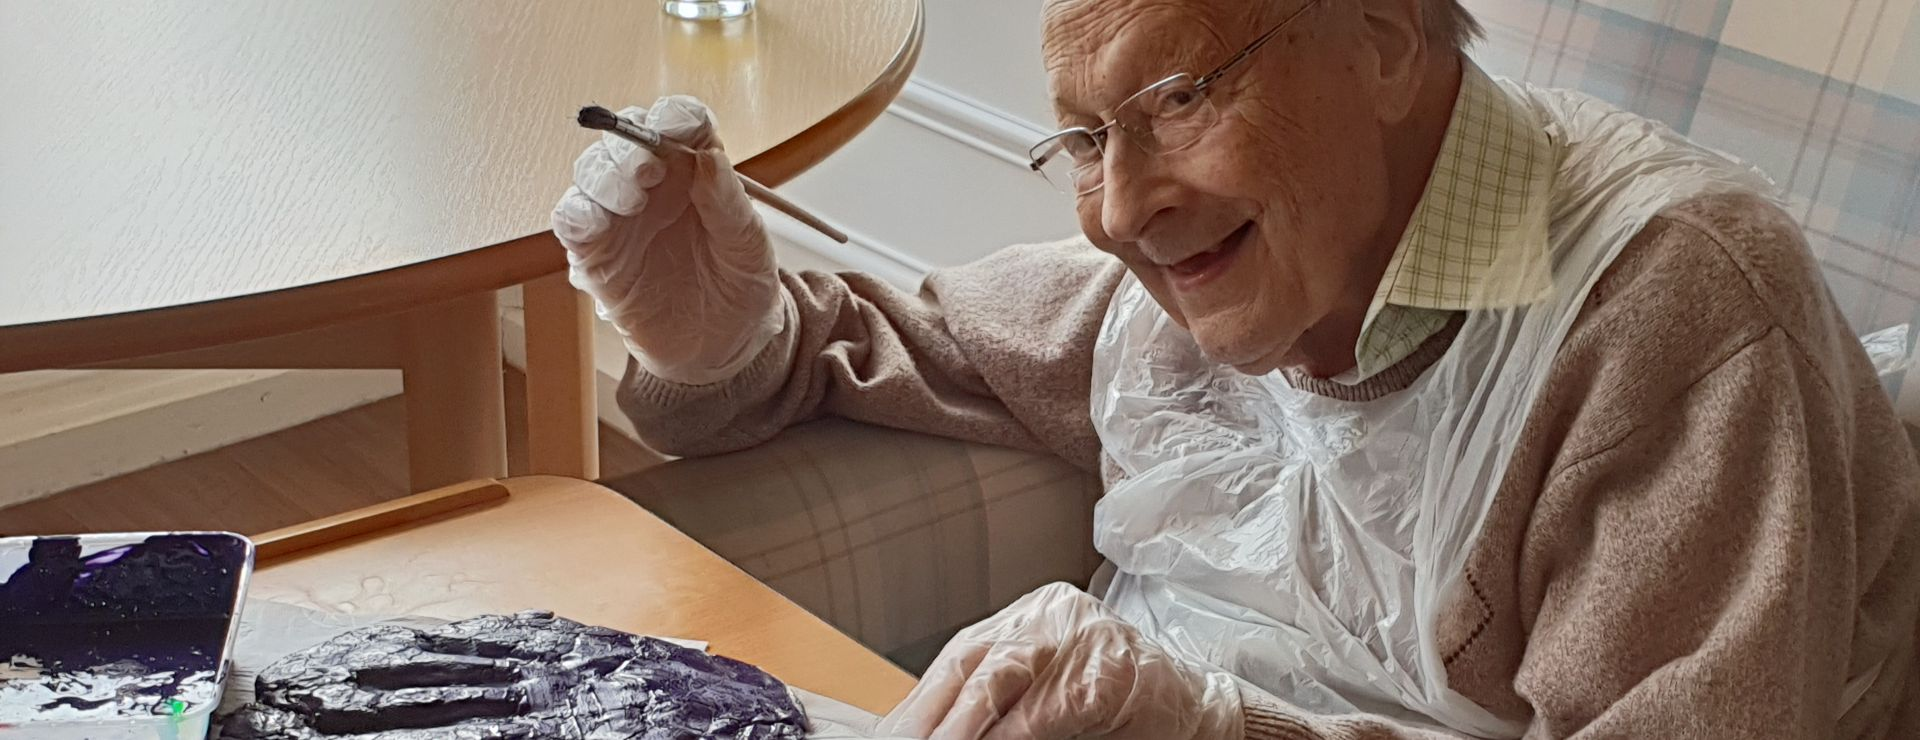 Harold painting-it-purple.